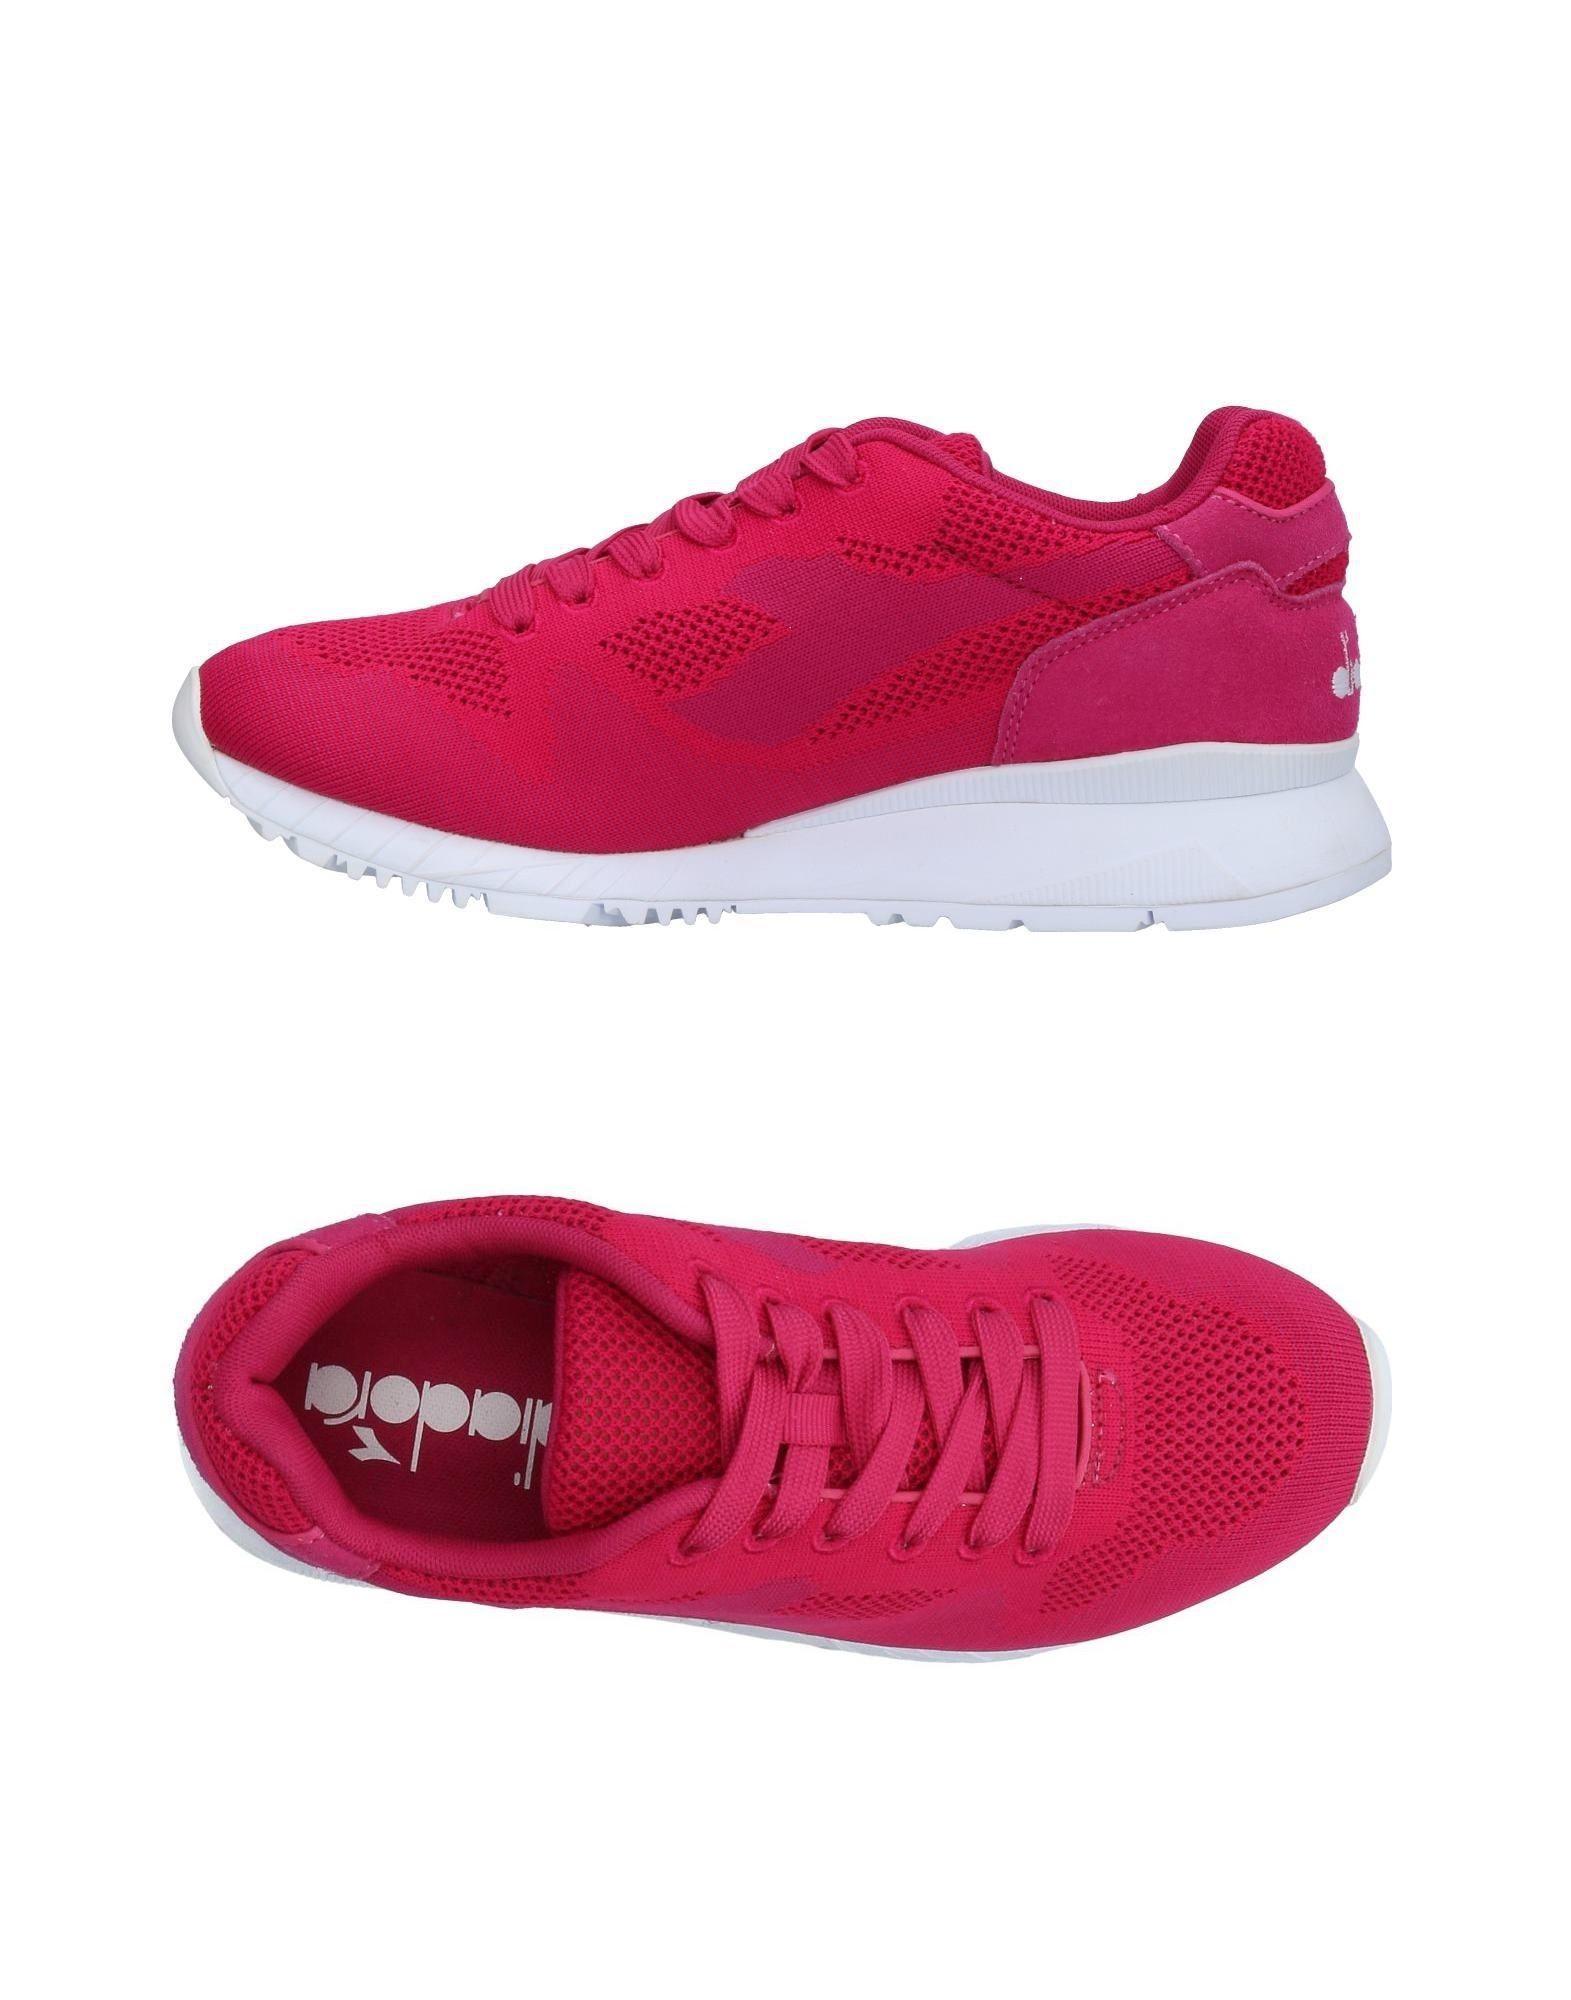 Diadora Sneakers In Garnet